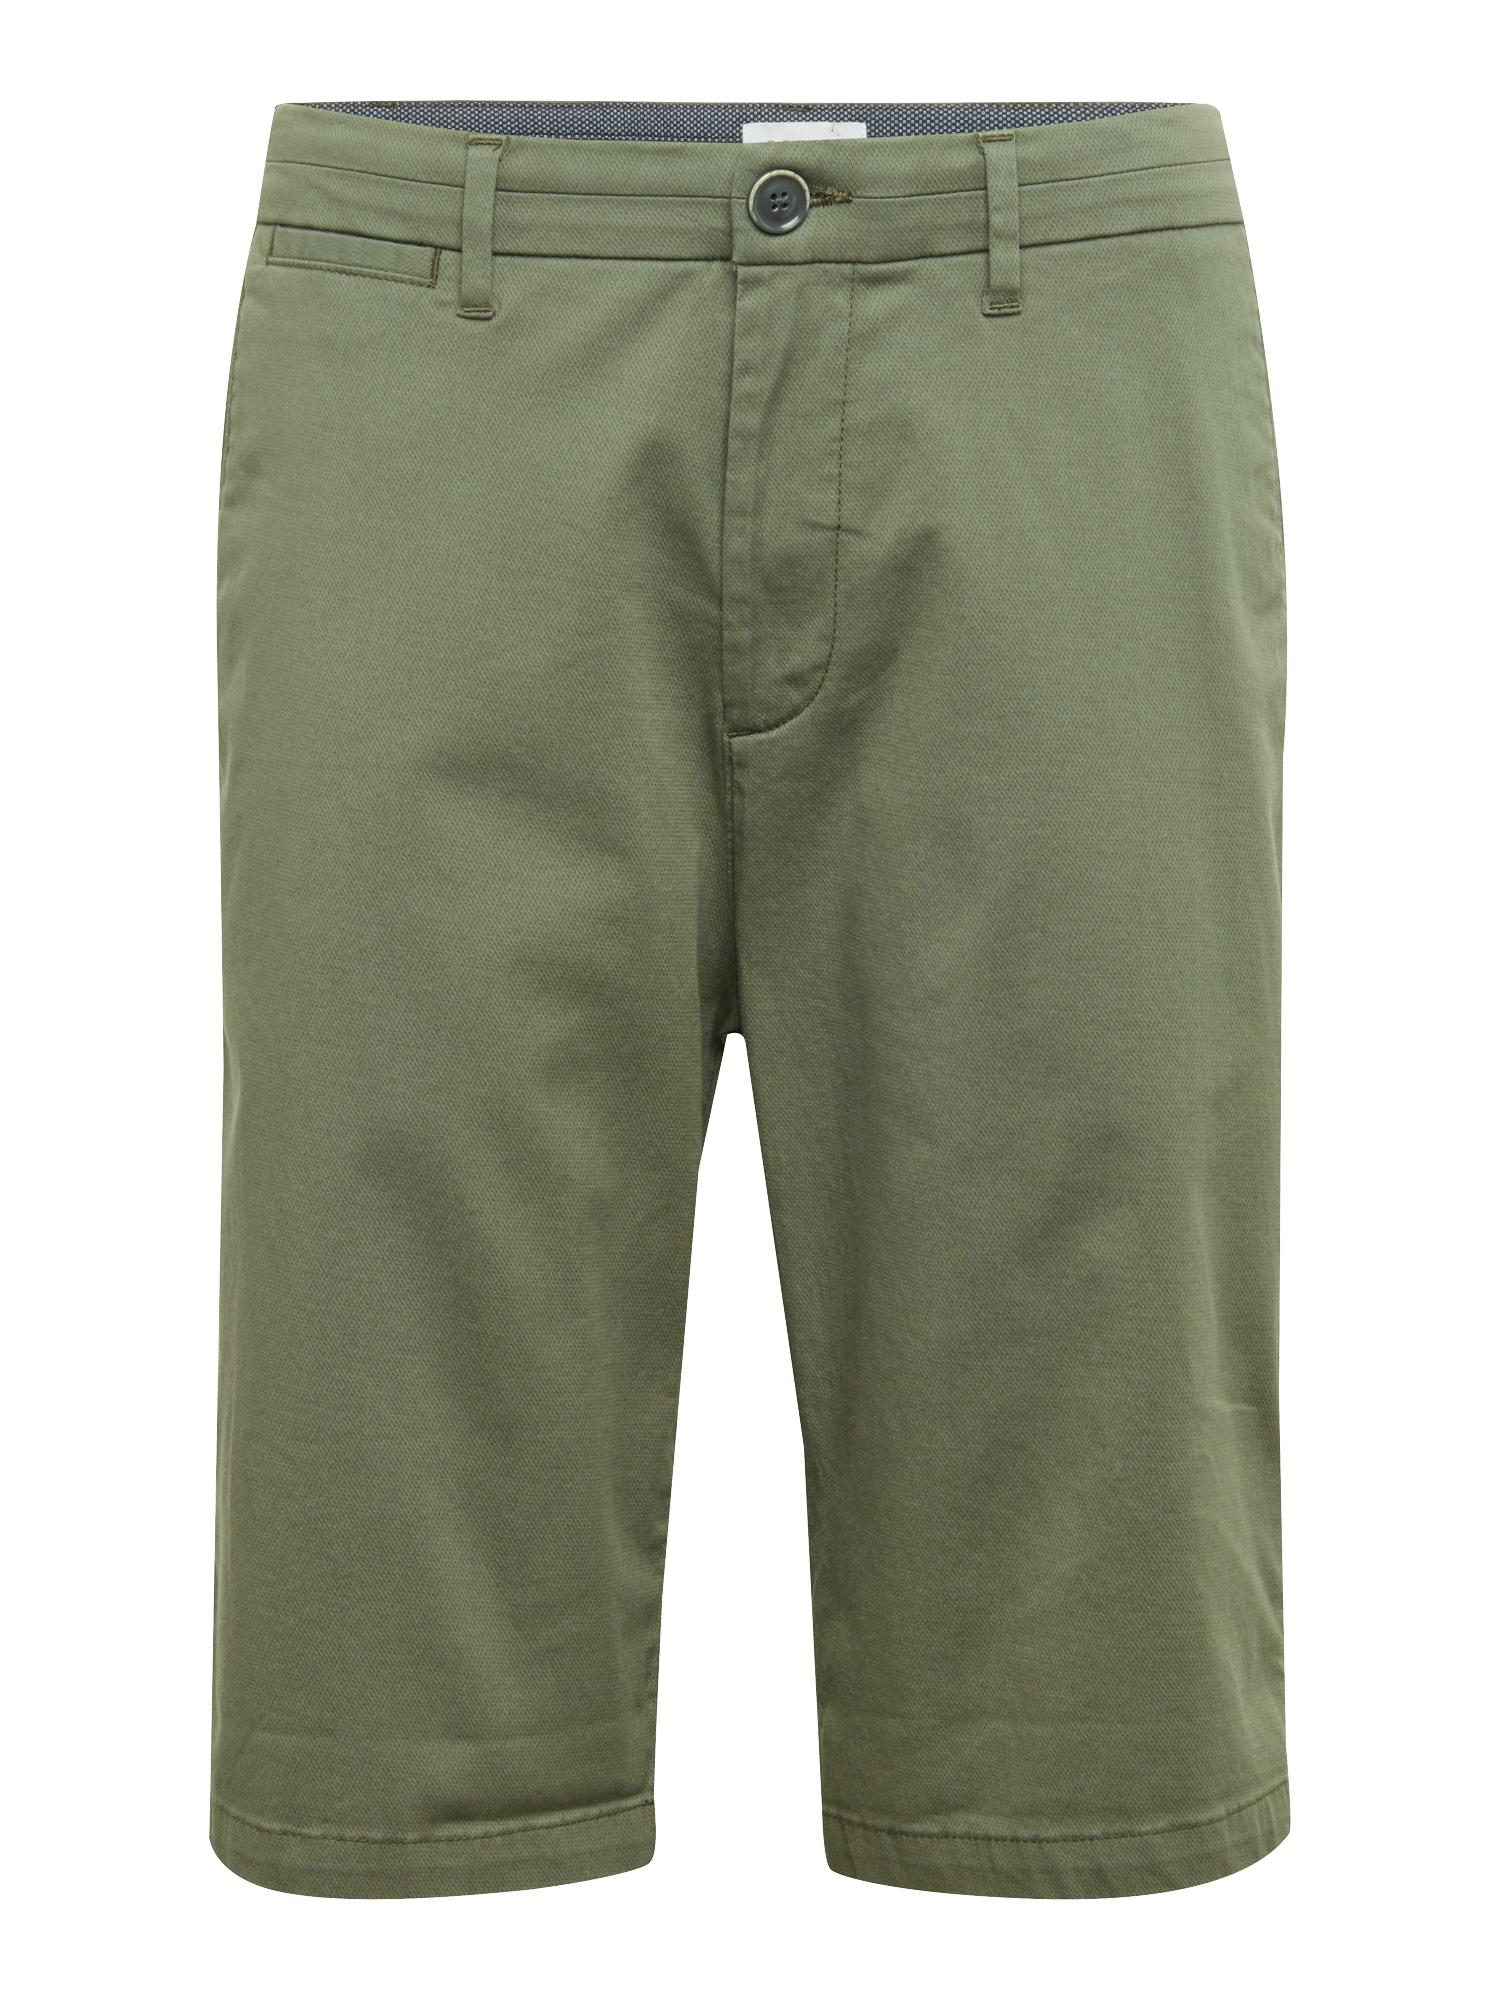 Chino kalhoty STRUC CHINO SHO khaki ESPRIT